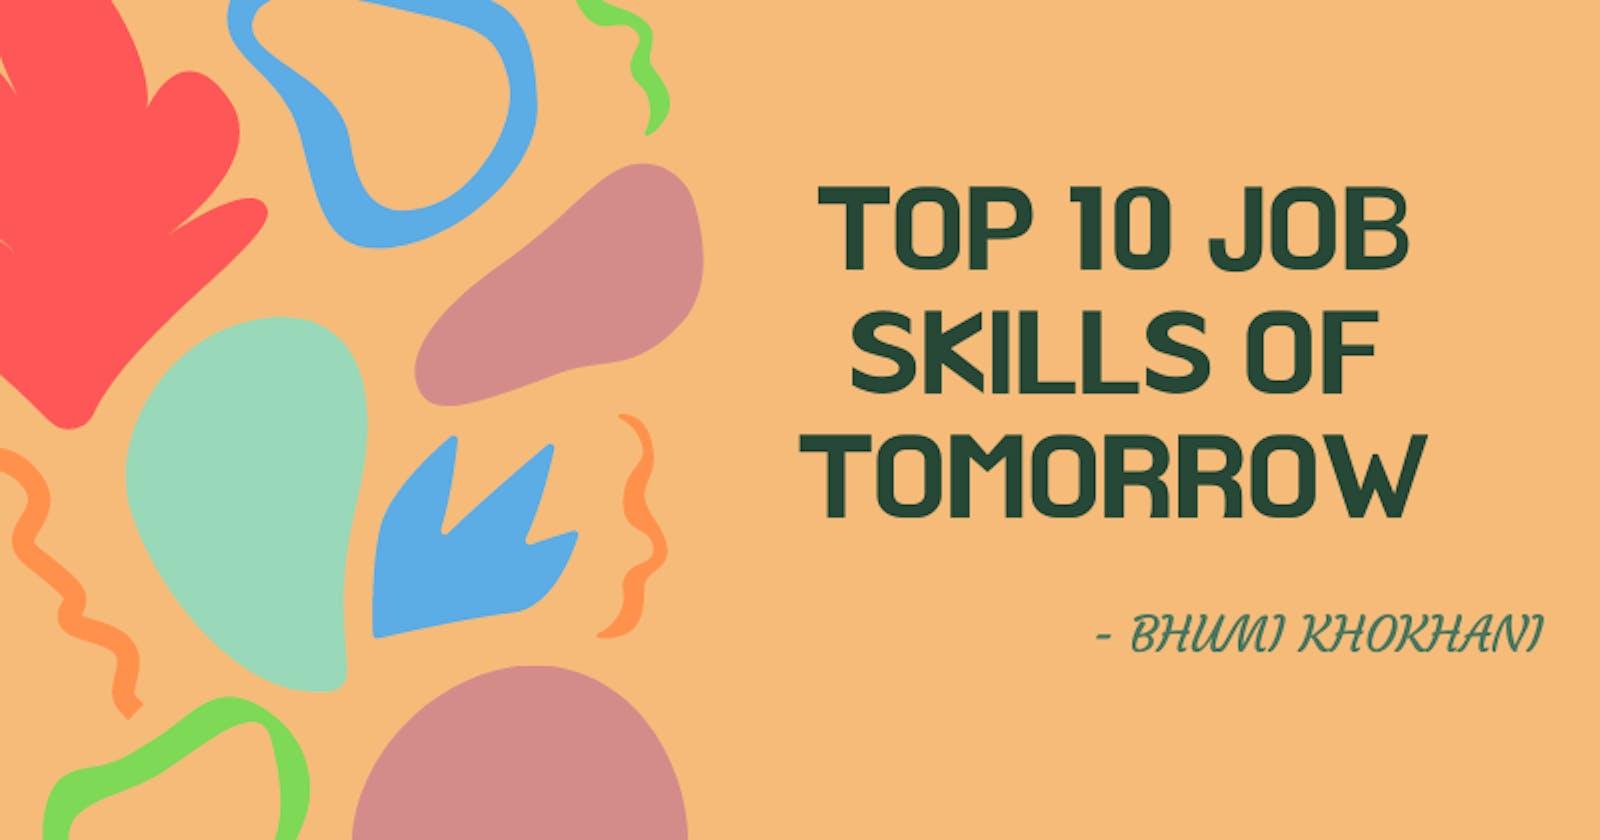 Top 10 job skills of Tomorrow